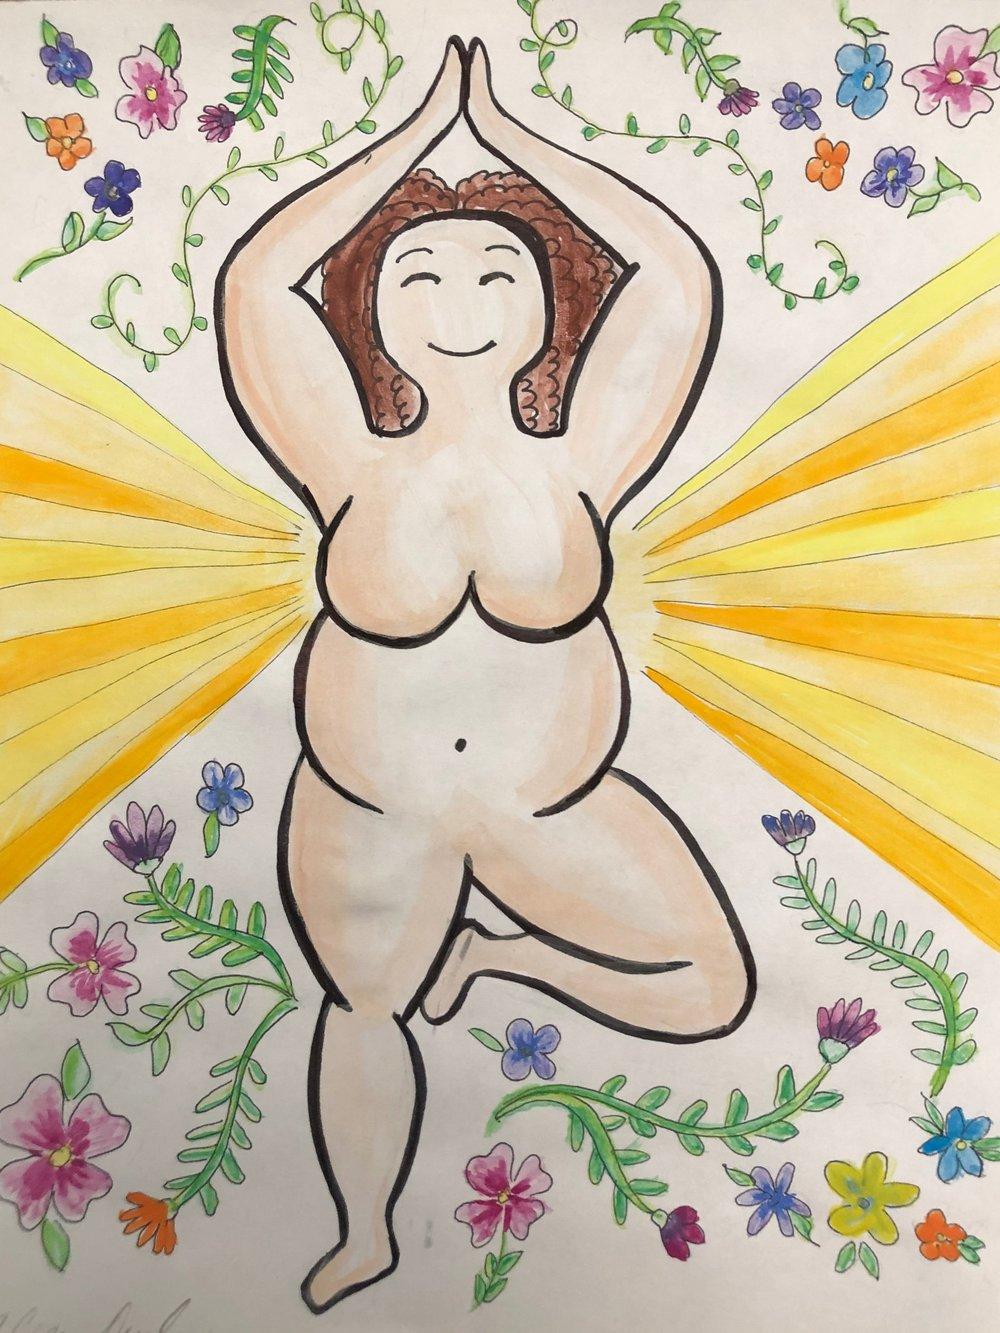 Art By The Beautifull Project Art Director Nicole Cisne-Durbin